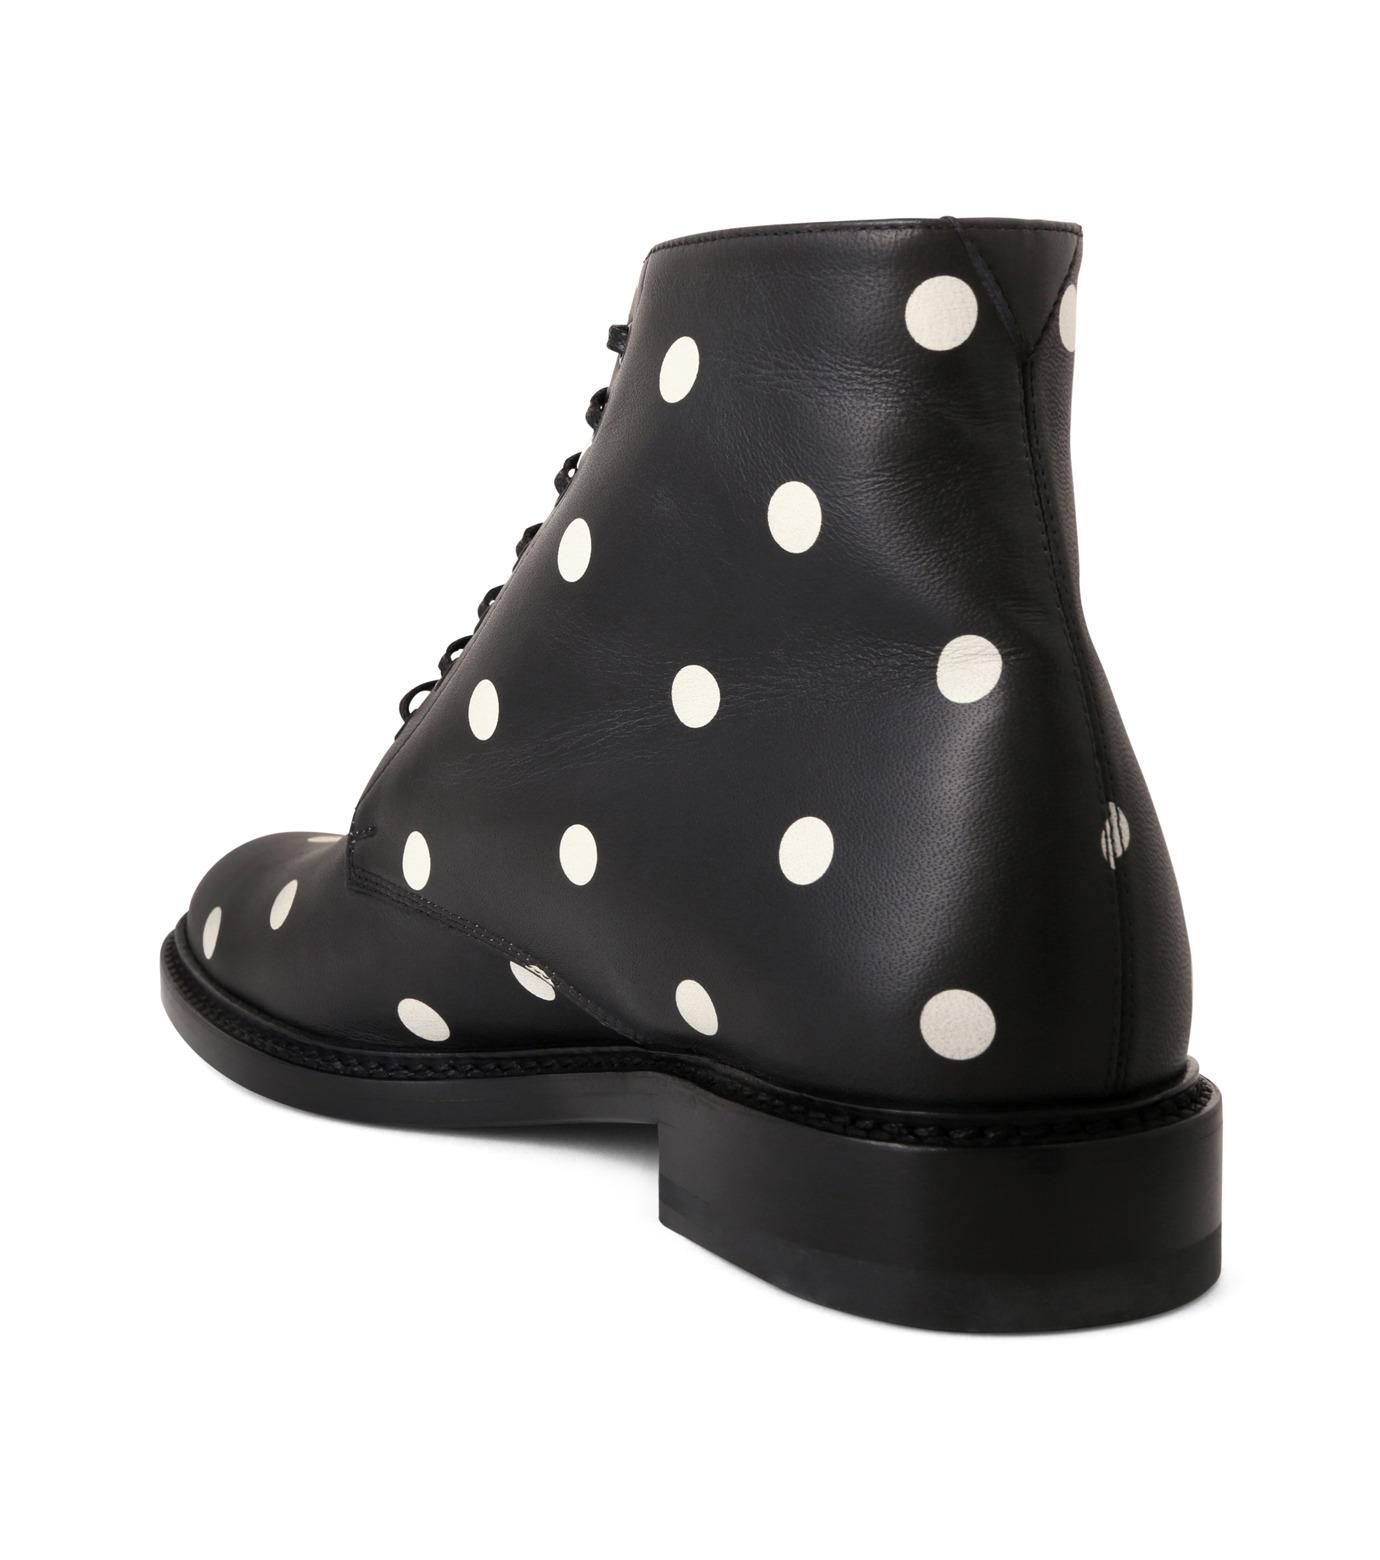 SAINT LAURENT(サンローラン)のLolita Lace Up Boots Dots-BLACK(ブーツ/boots)-417667-CZC00-13 拡大詳細画像2